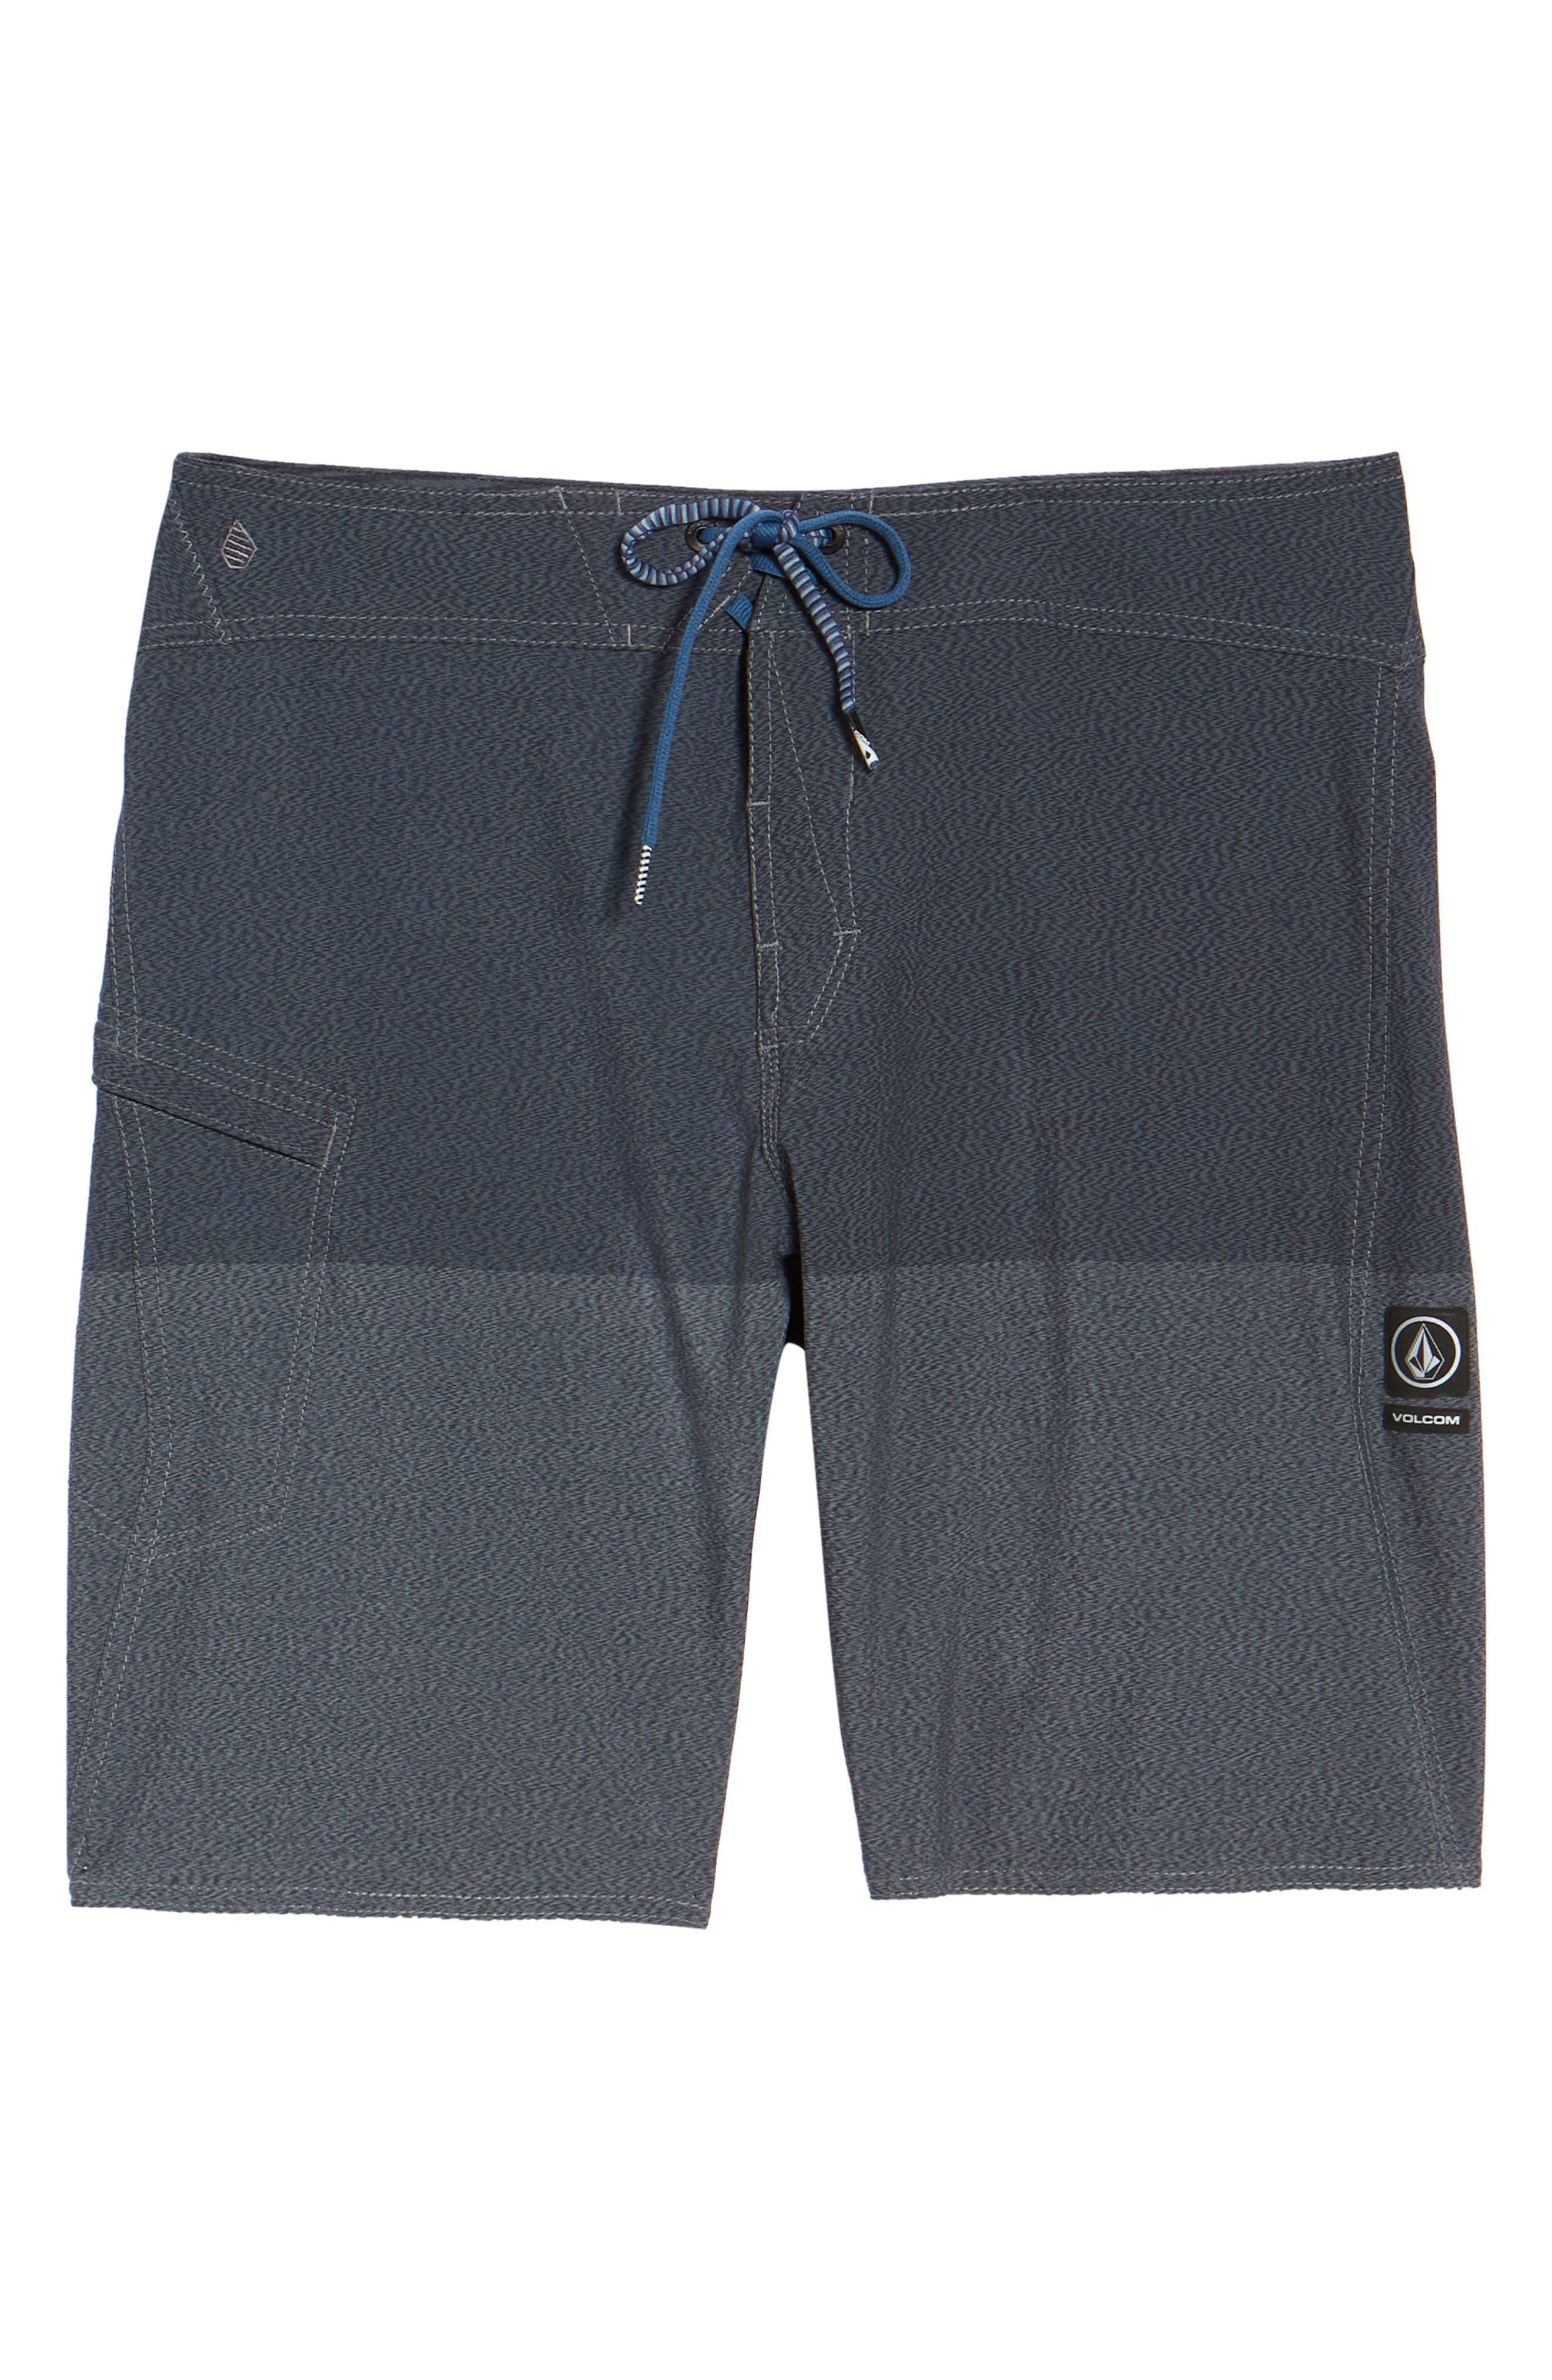 Lido Heather Board Shorts,                             Alternate thumbnail 6, color,                             Blue Smoke